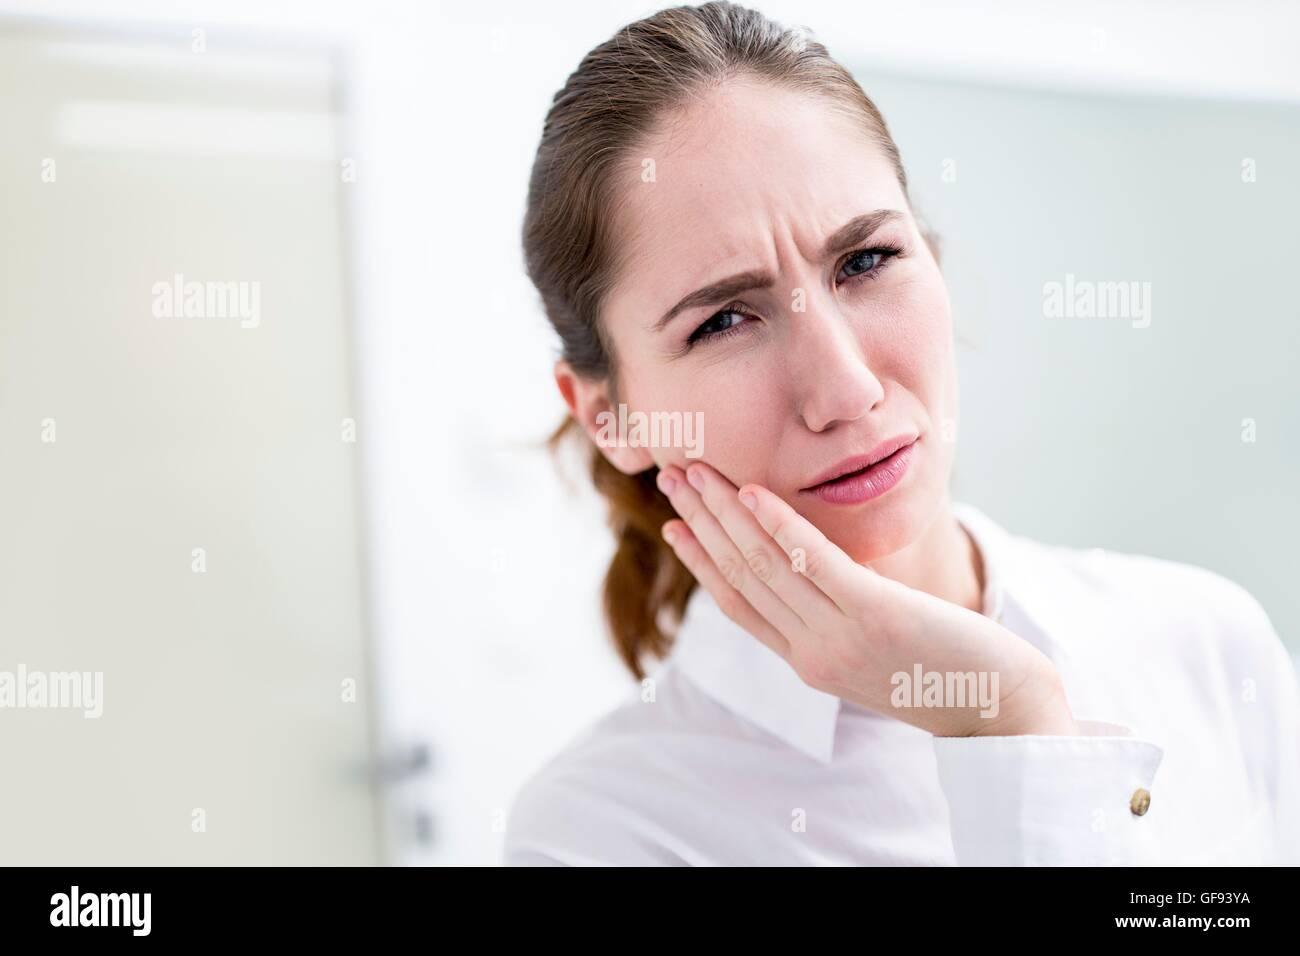 -MODELL VERÖFFENTLICHT. Junge Frau leidet Zahnschmerzen, Studio gedreht. Stockbild